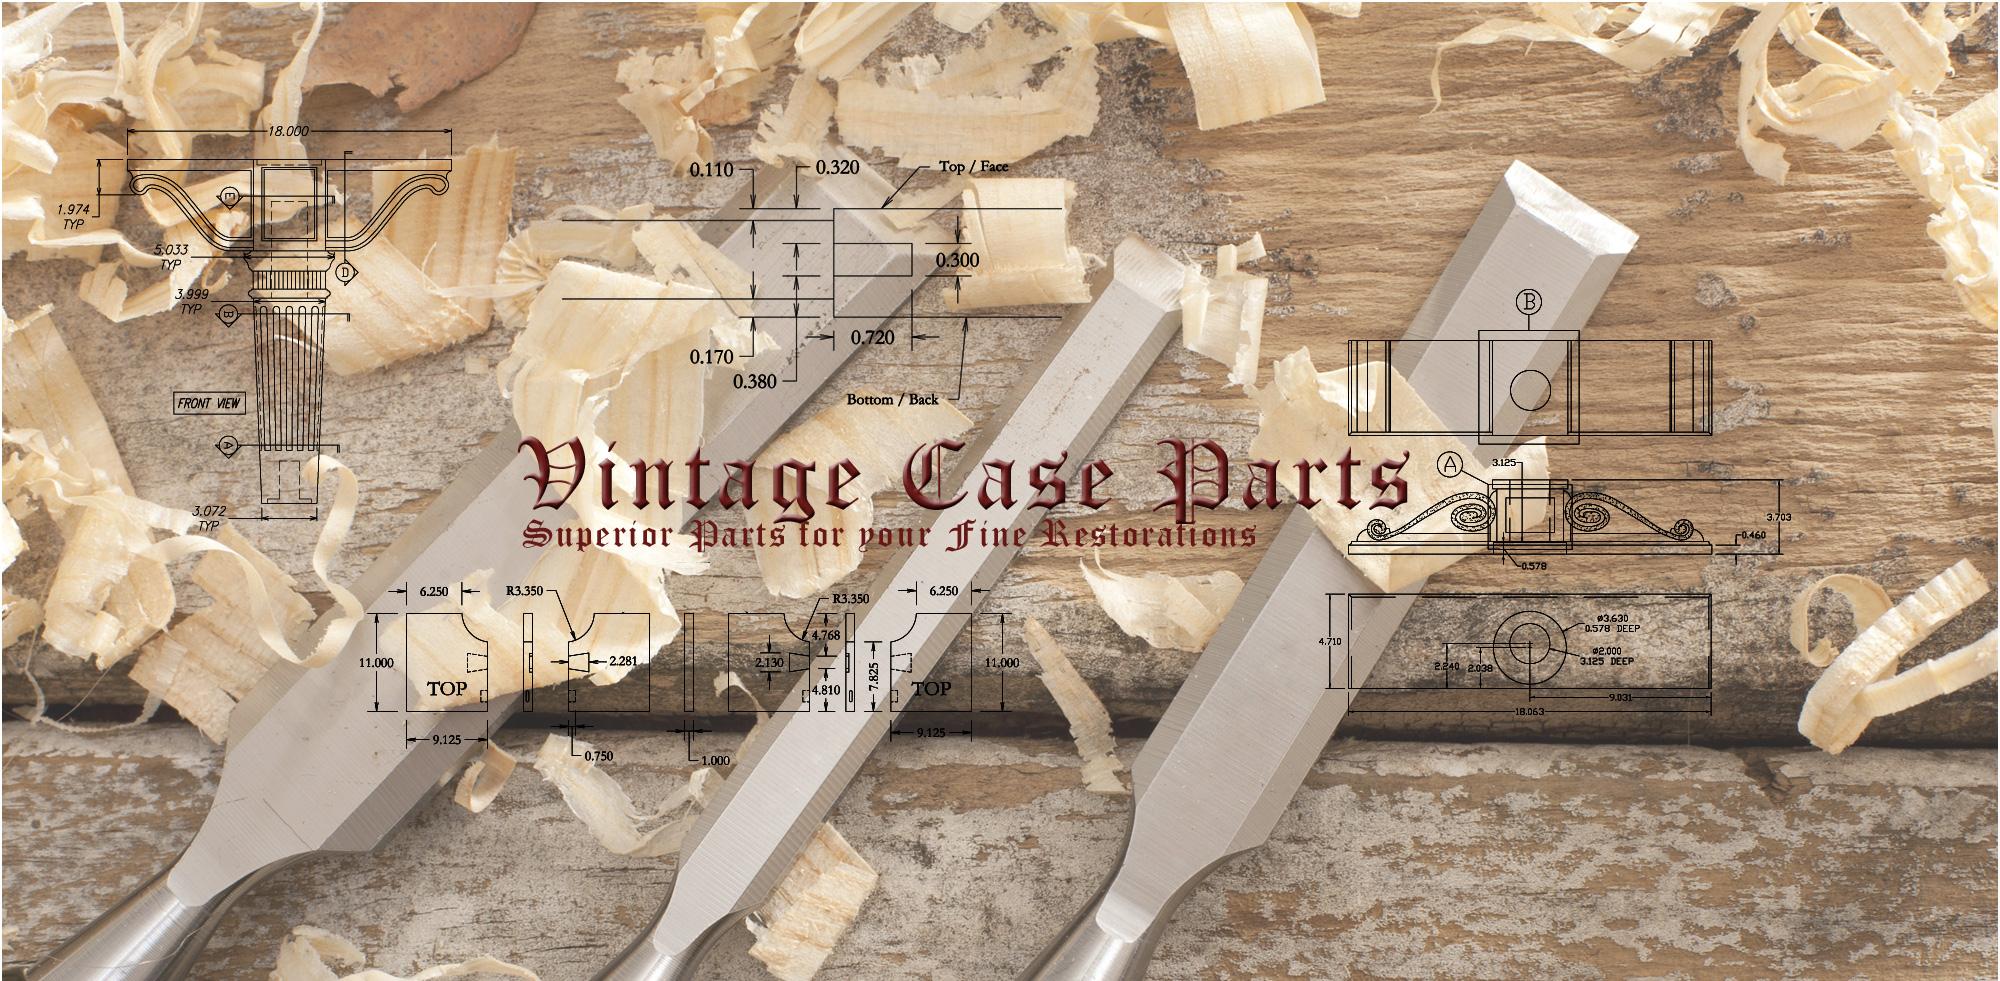 Vintage Case Parts